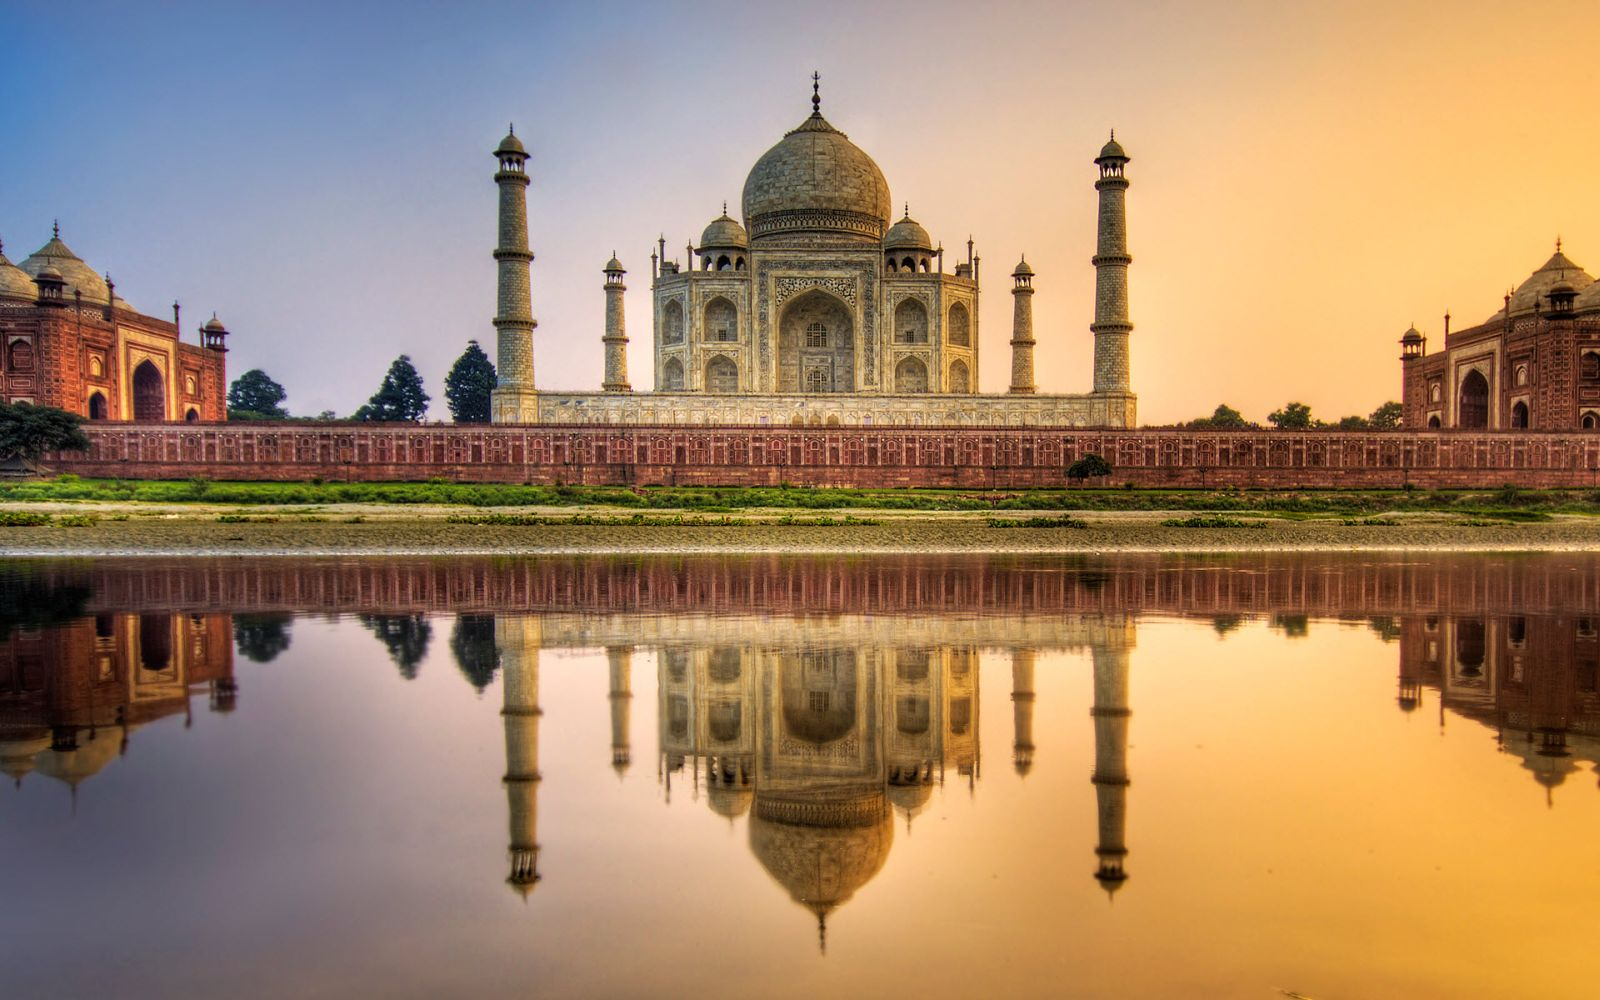 Taj Mahal The Incredible Place in India via Wallpaper in HD 1600x1000